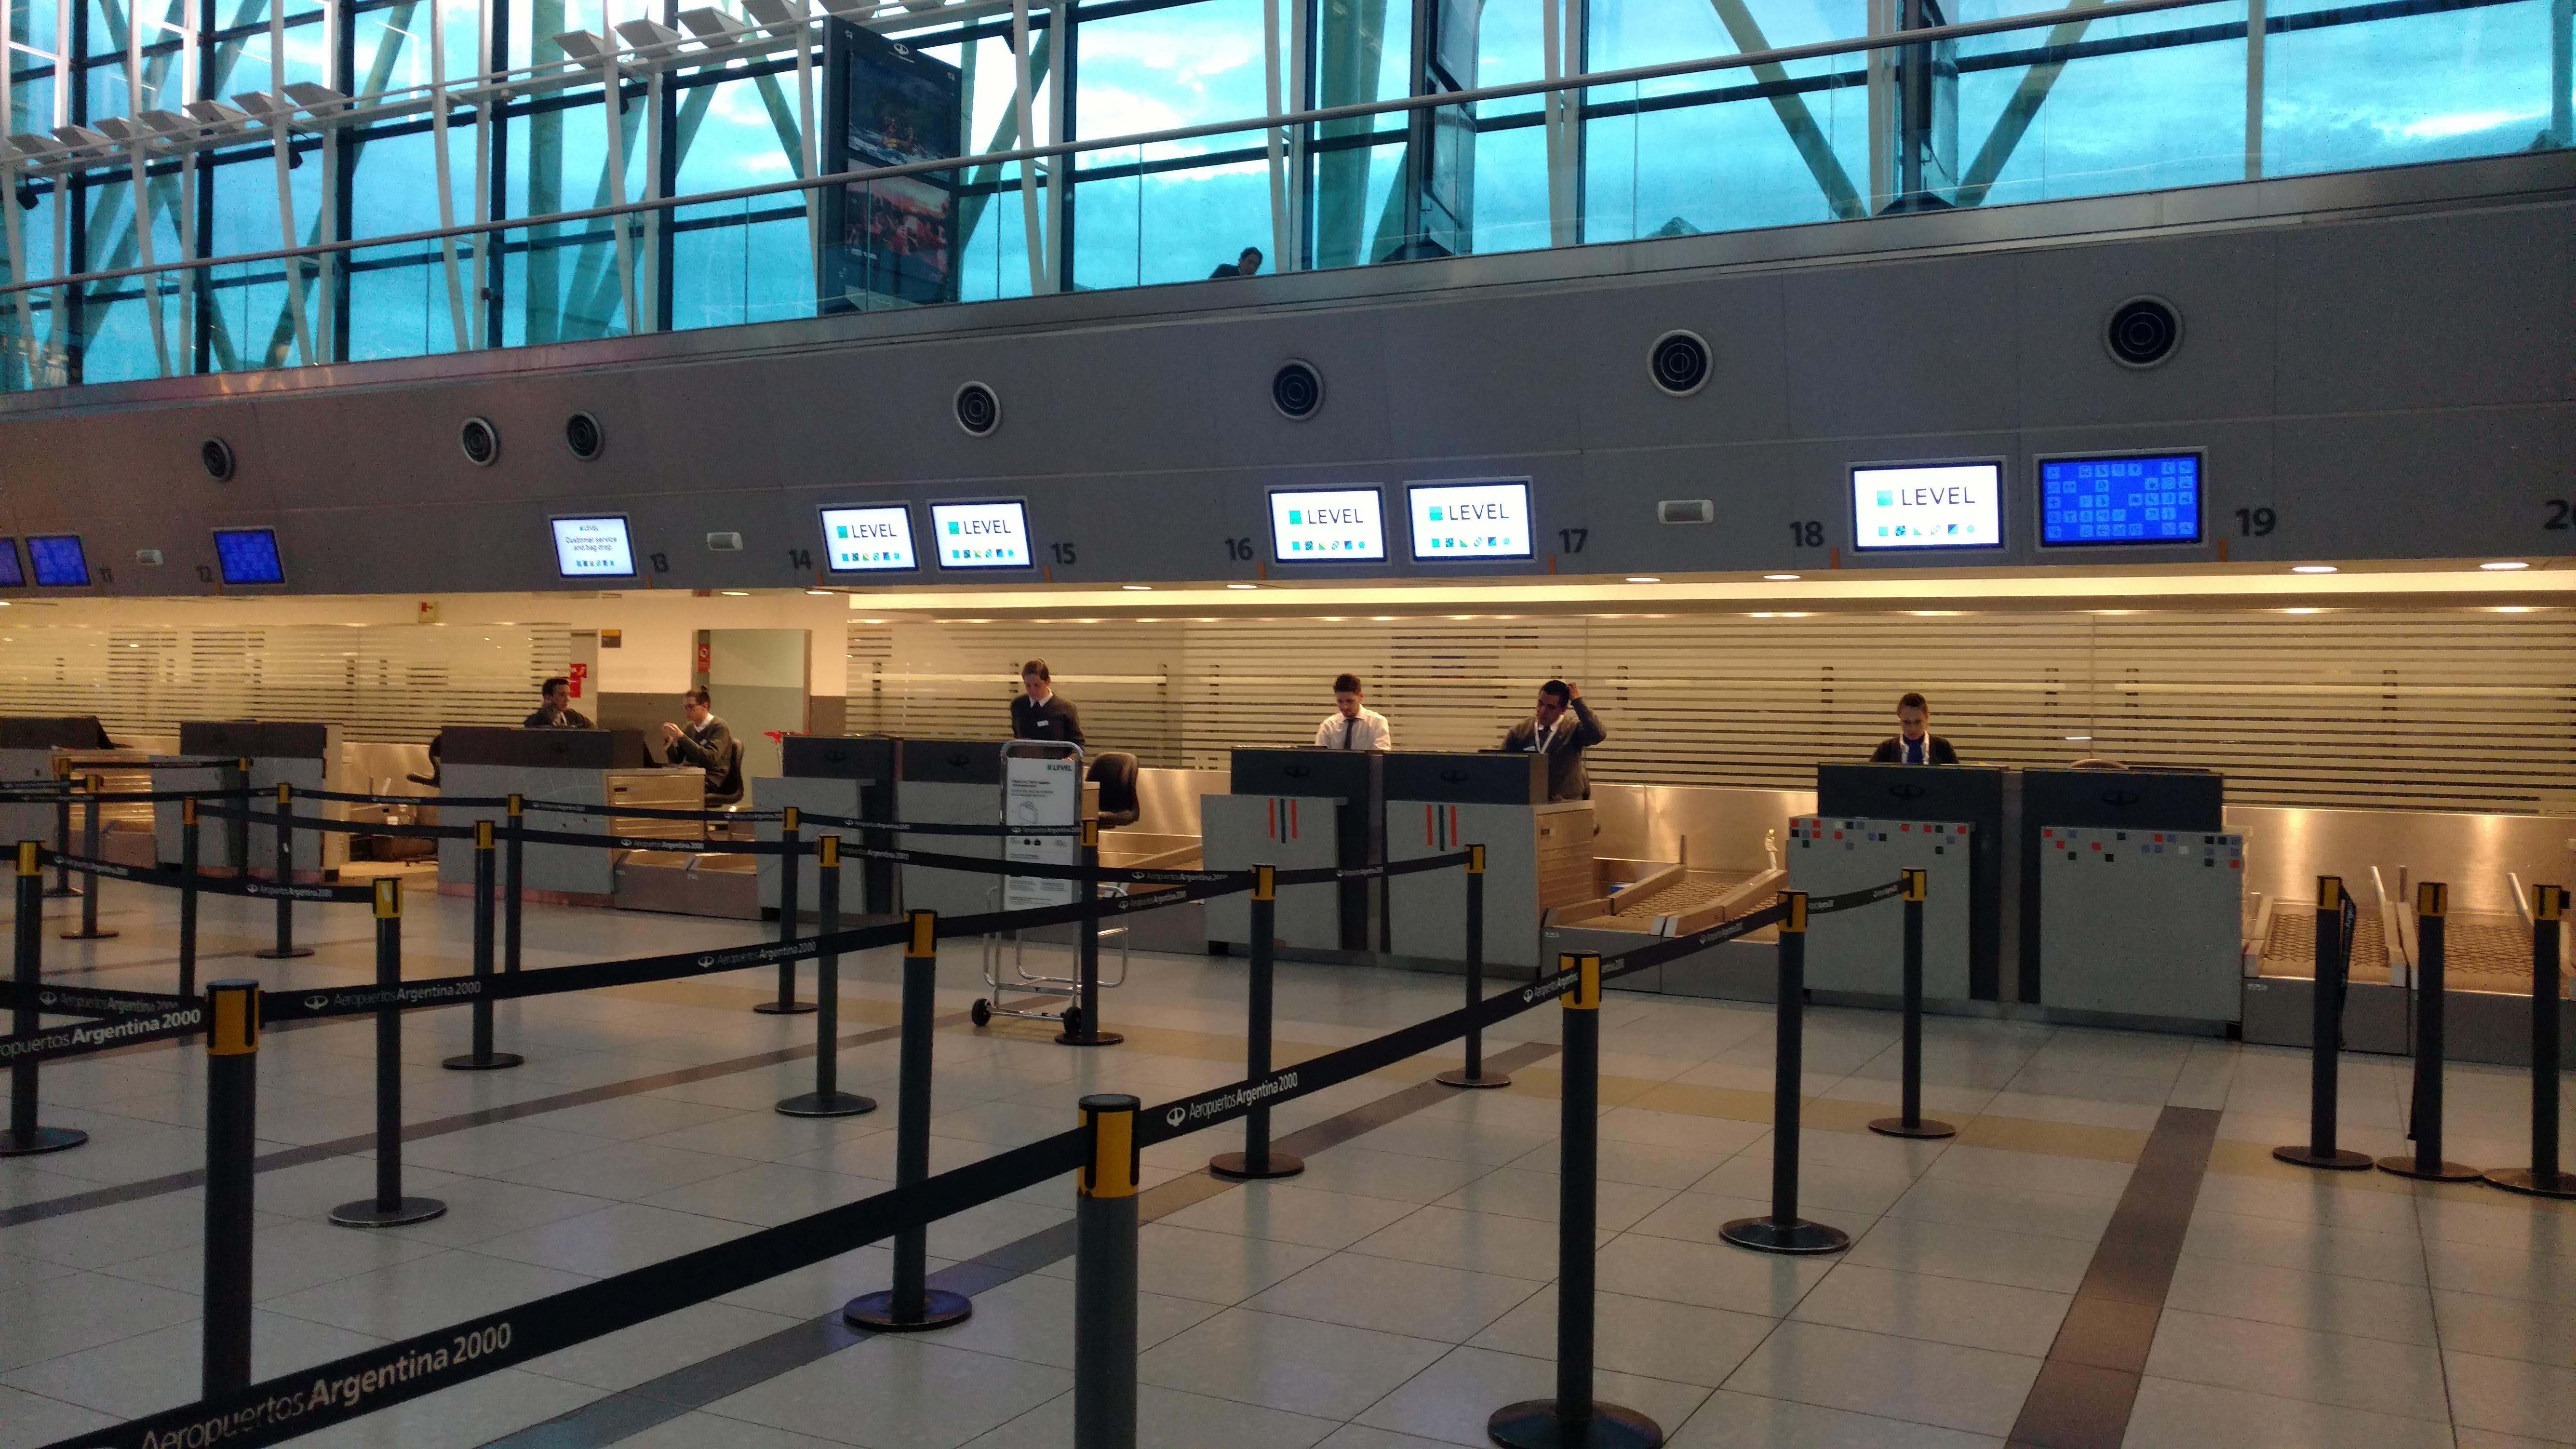 aeropuerto, ezeiza, level, volar con level, aerolinea, iberia, reporte de vuelo, low cost, barcelona